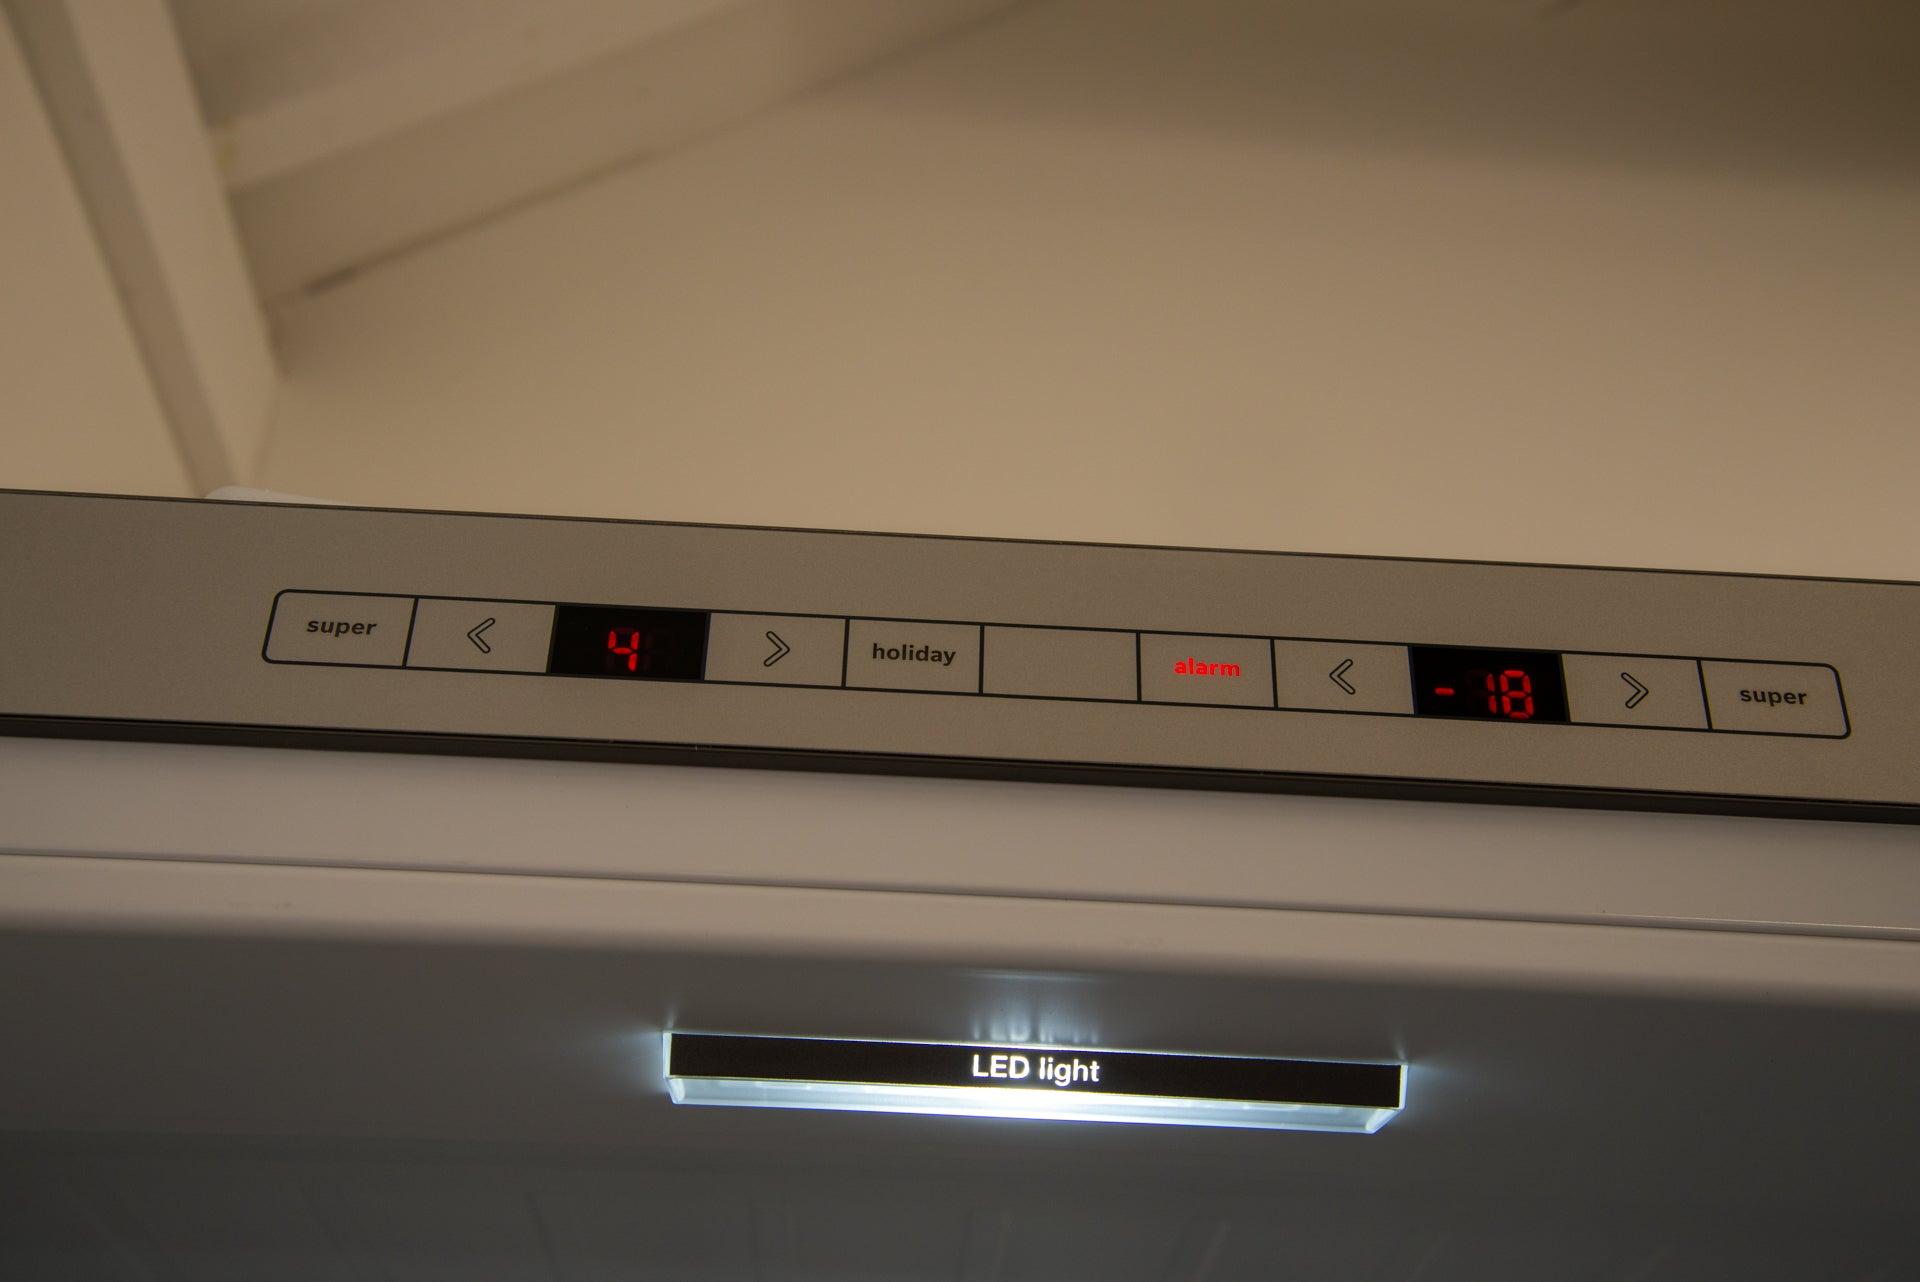 Bosch Serie 6 KGE49AICAG controls